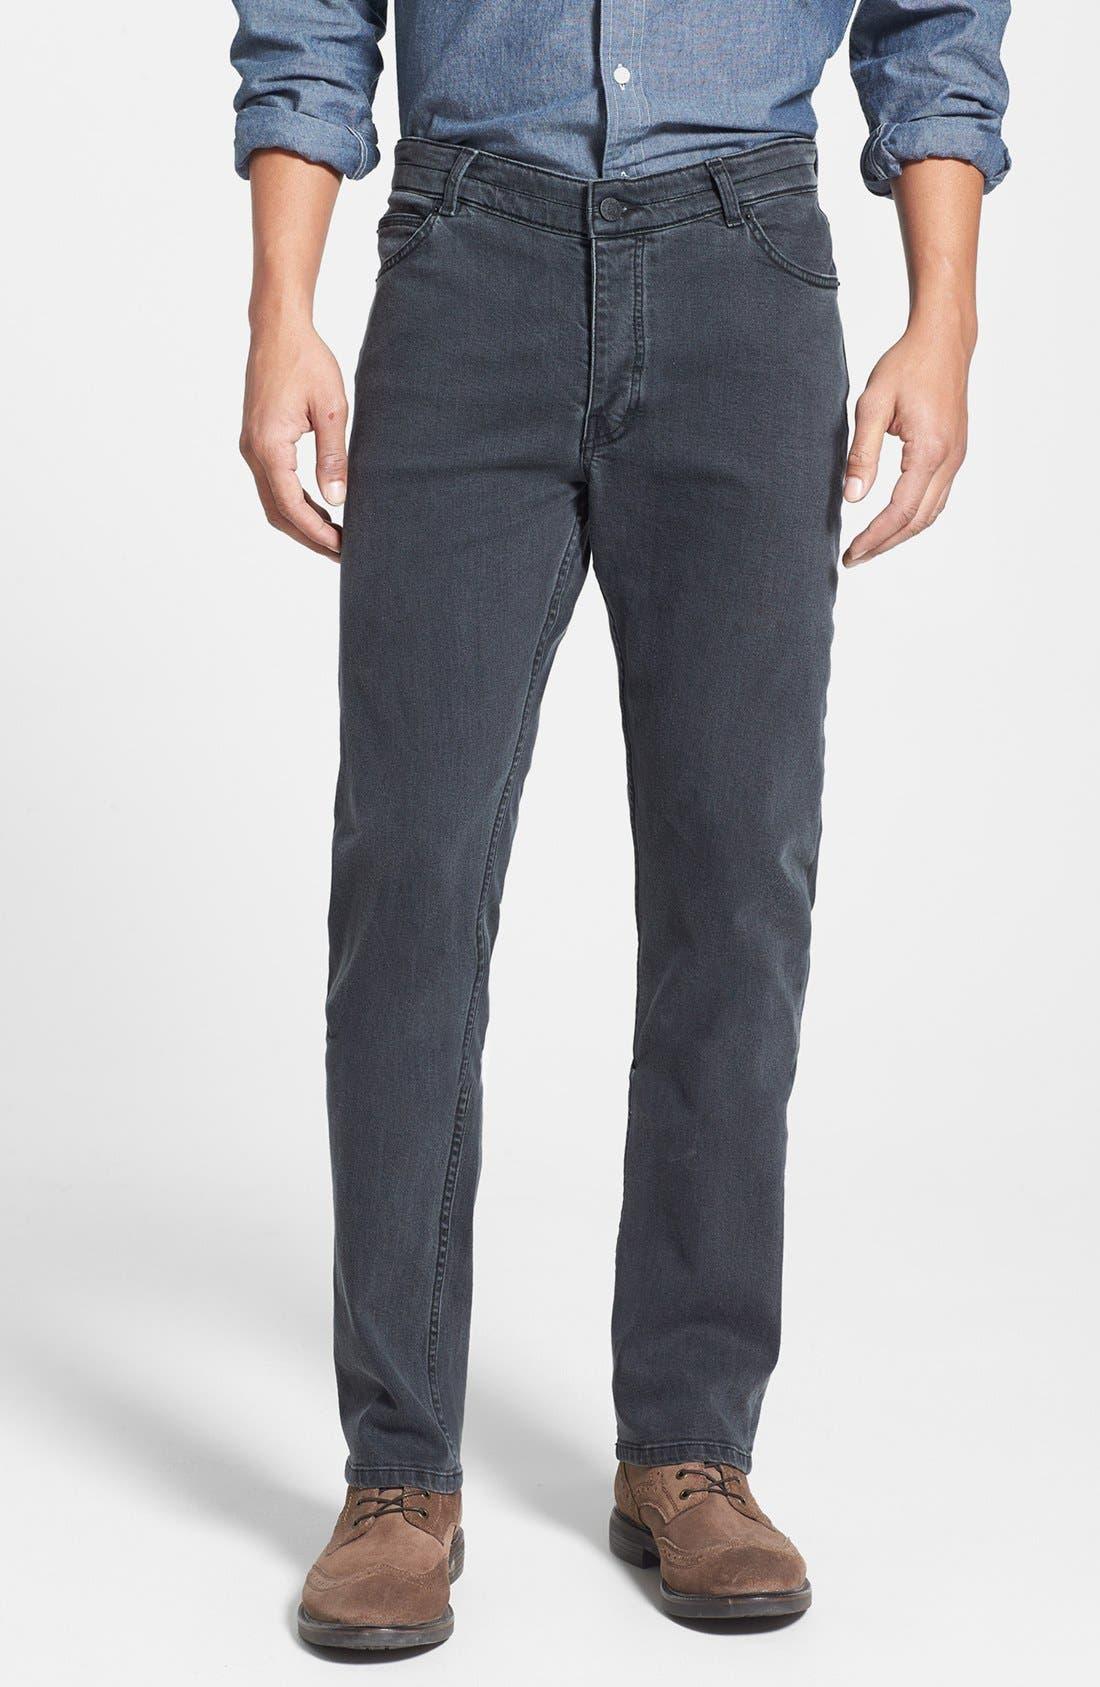 Main Image - Surface to Air Five Pocket Slim Fit Pants